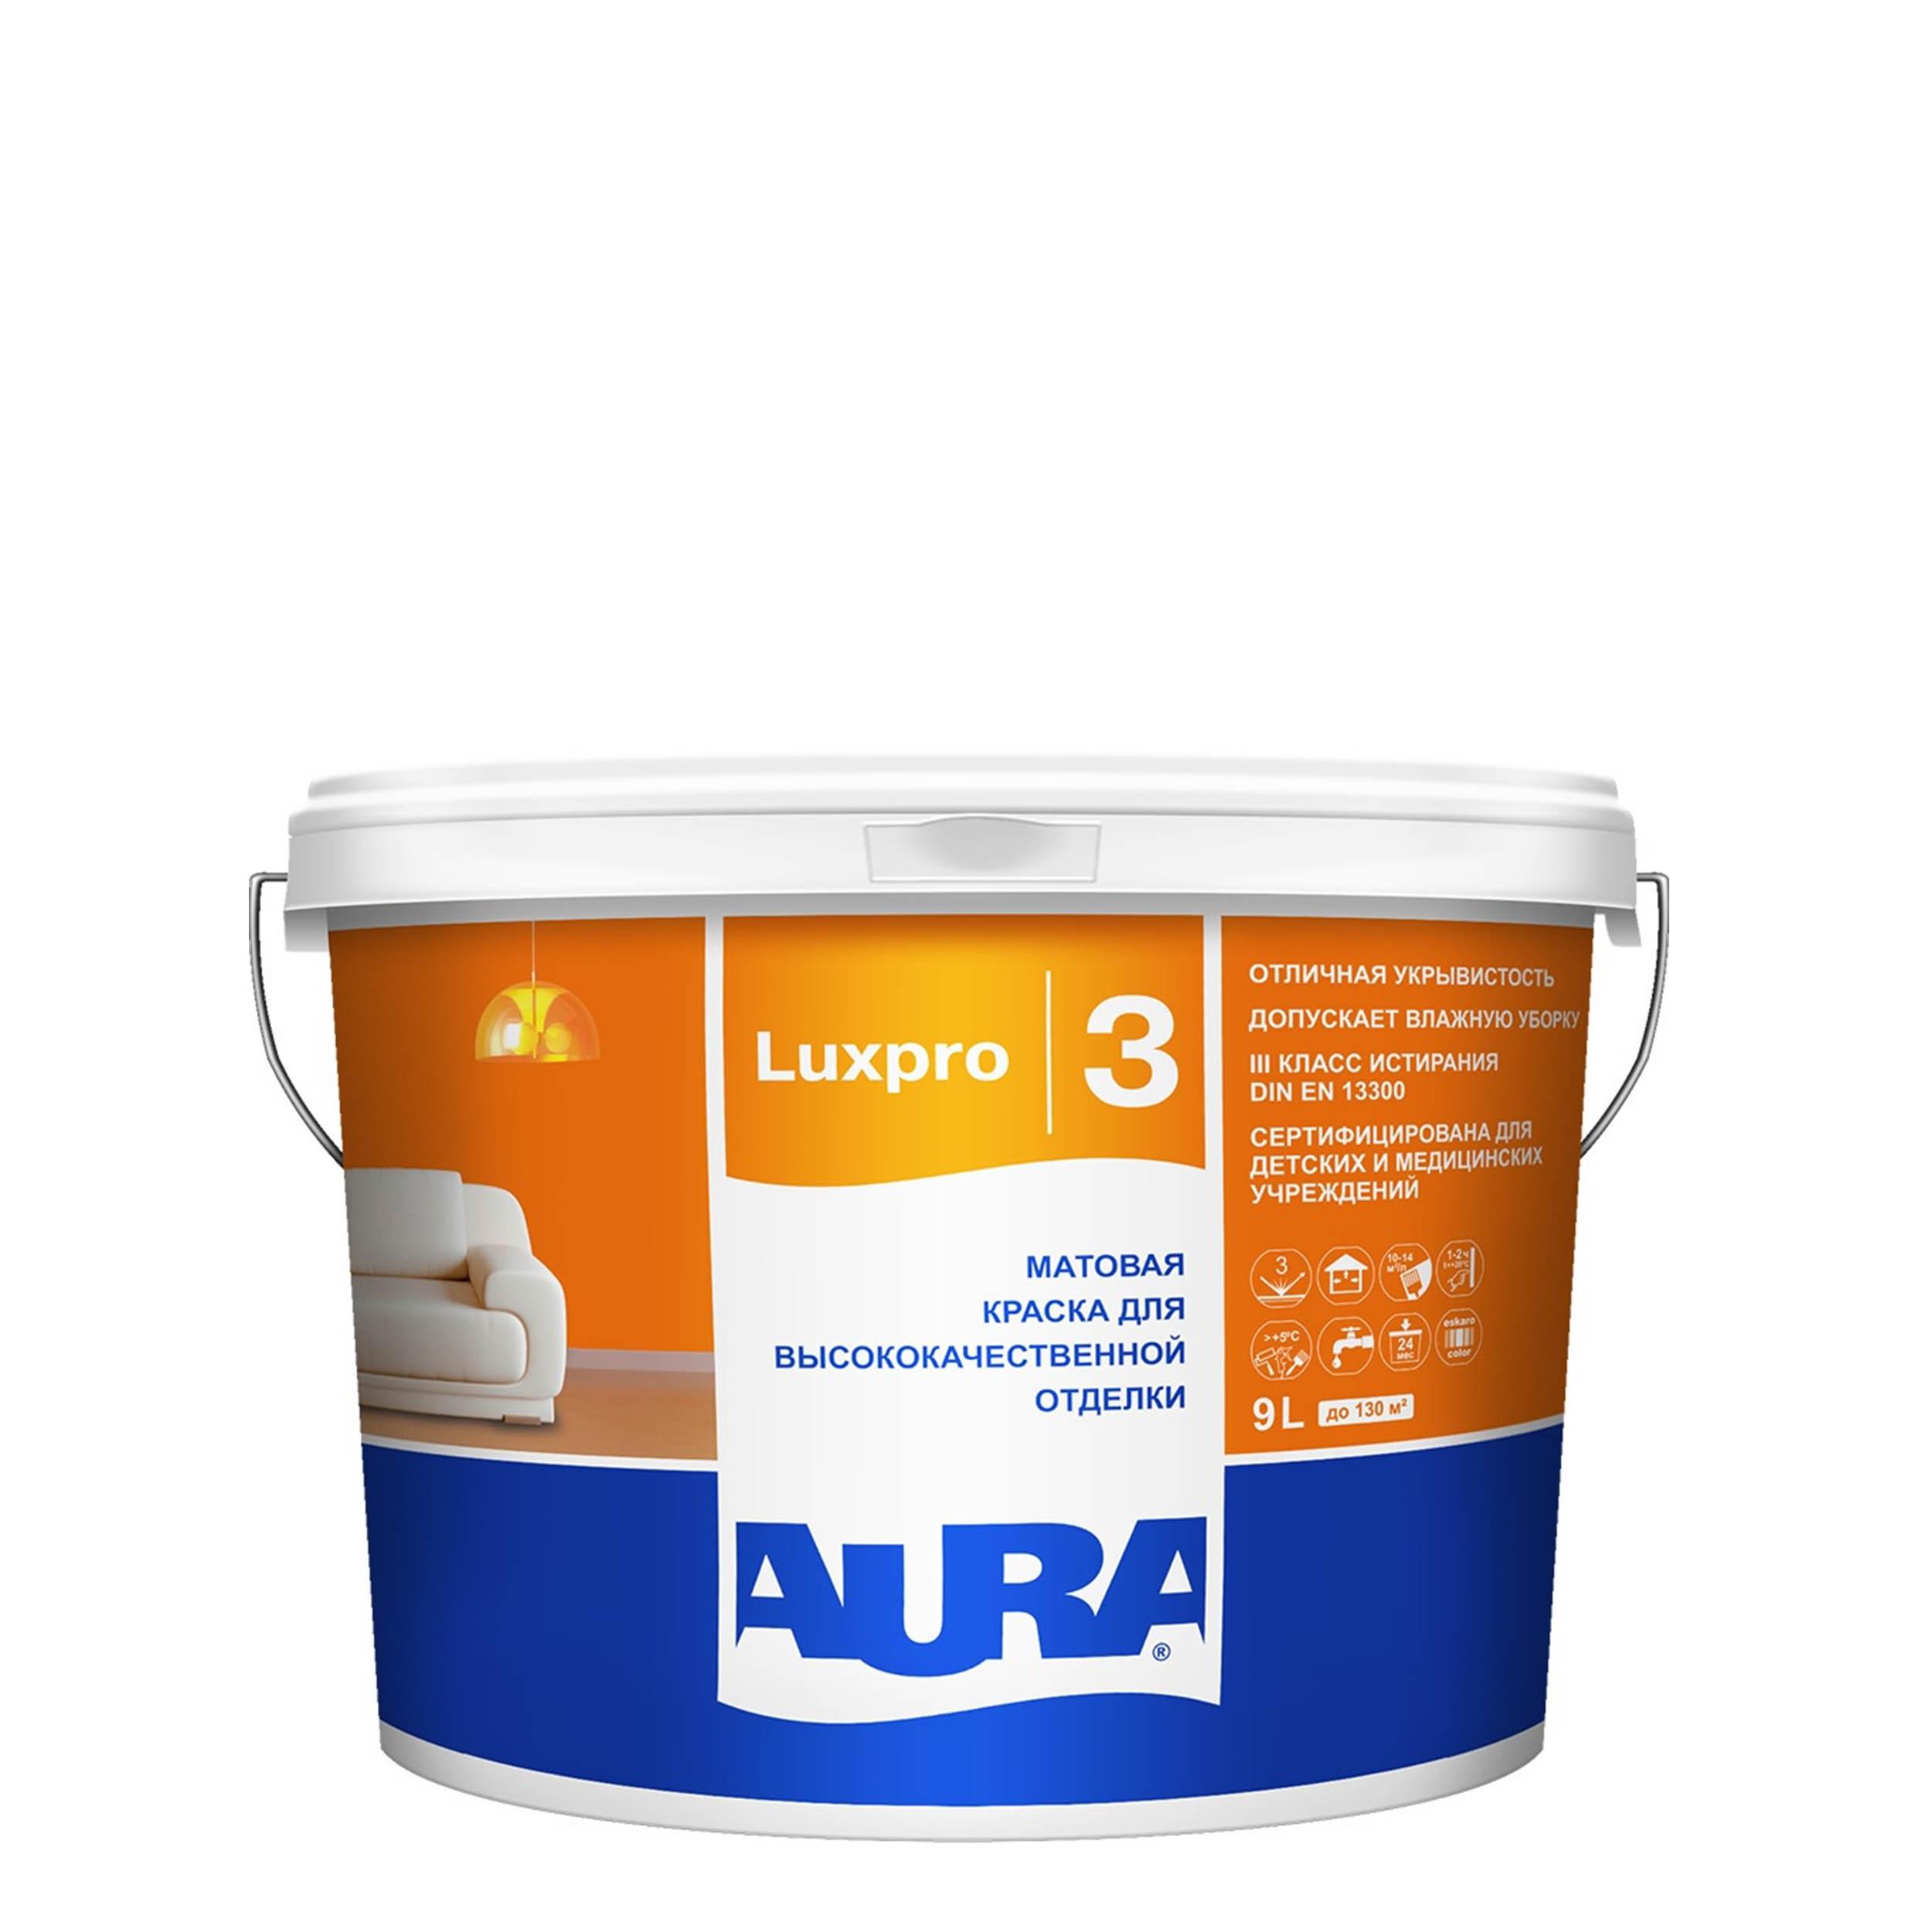 Фото 3 - Краска интерьерная, Aura LuxPRO 3, RAL 3015, 11 кг.